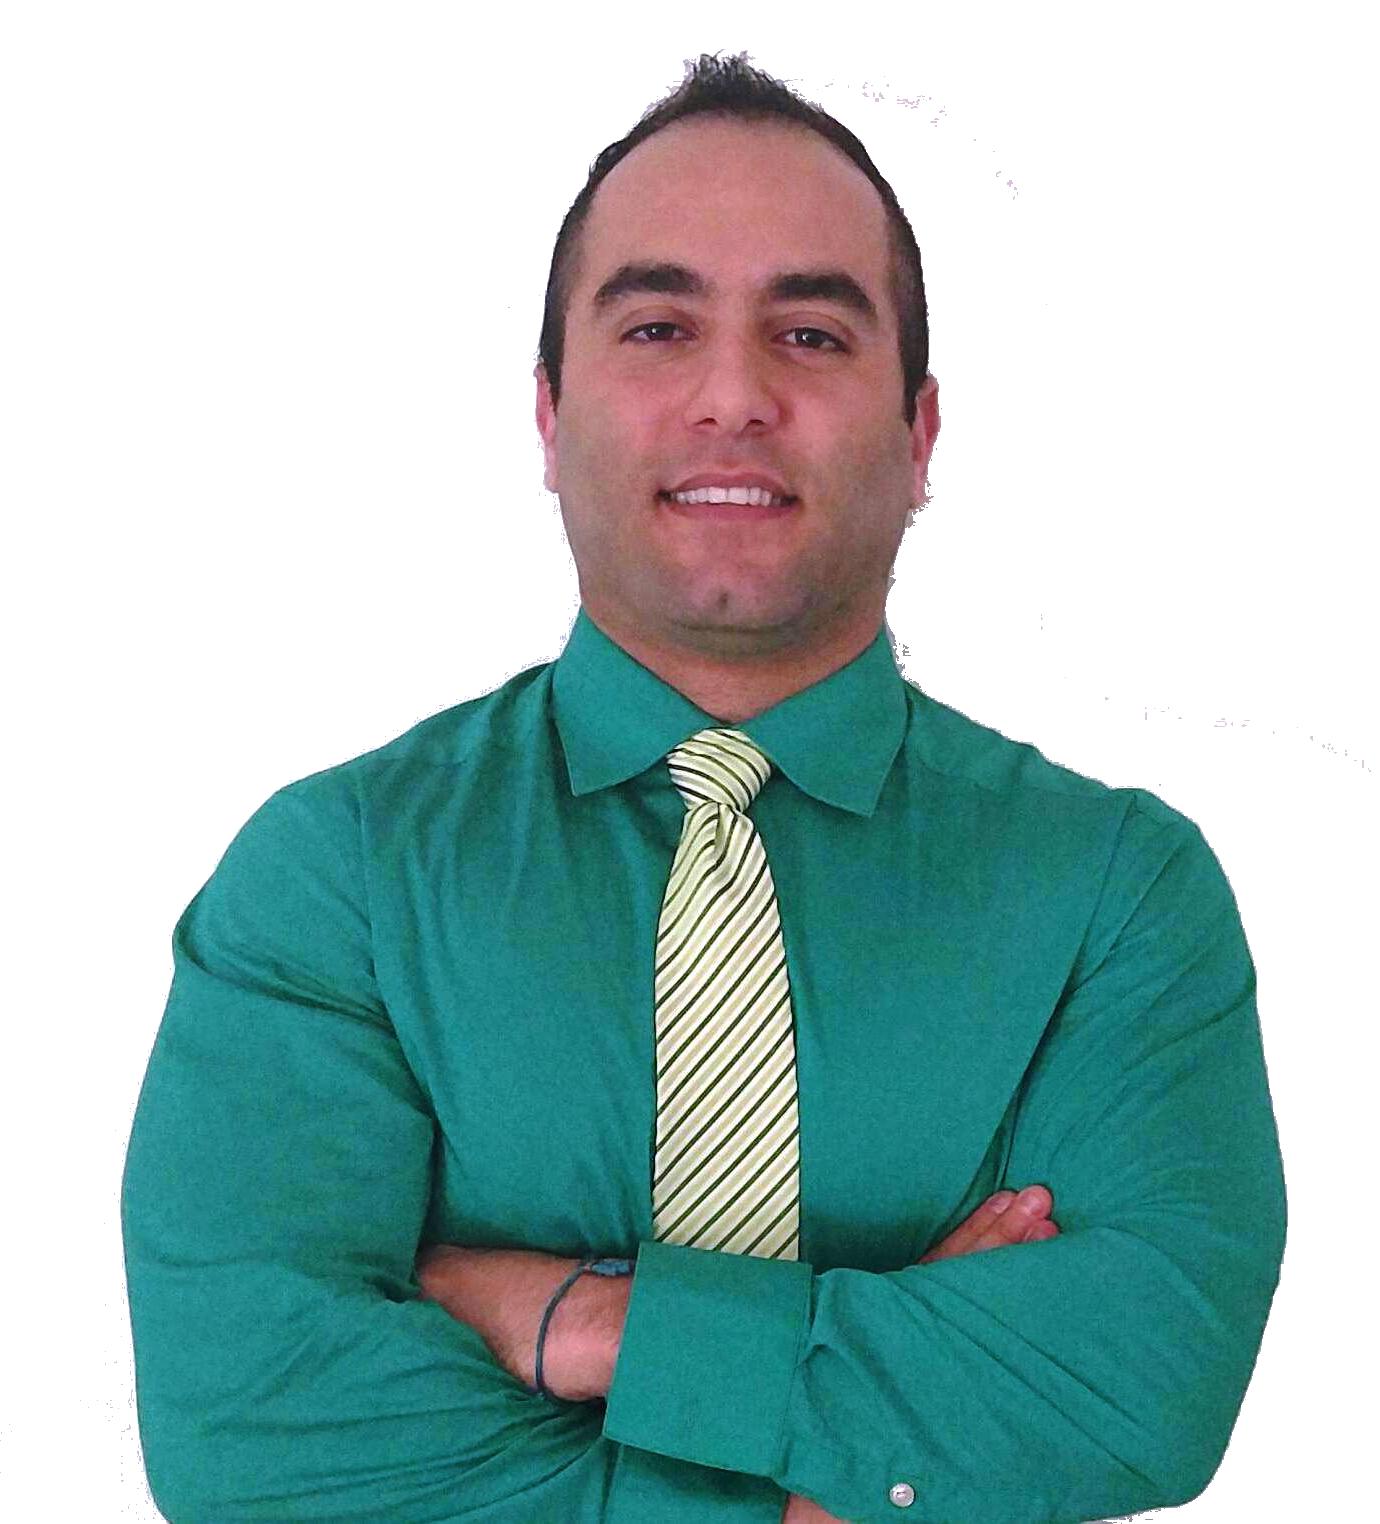 Dr Zeitouni dentist in Locust NC